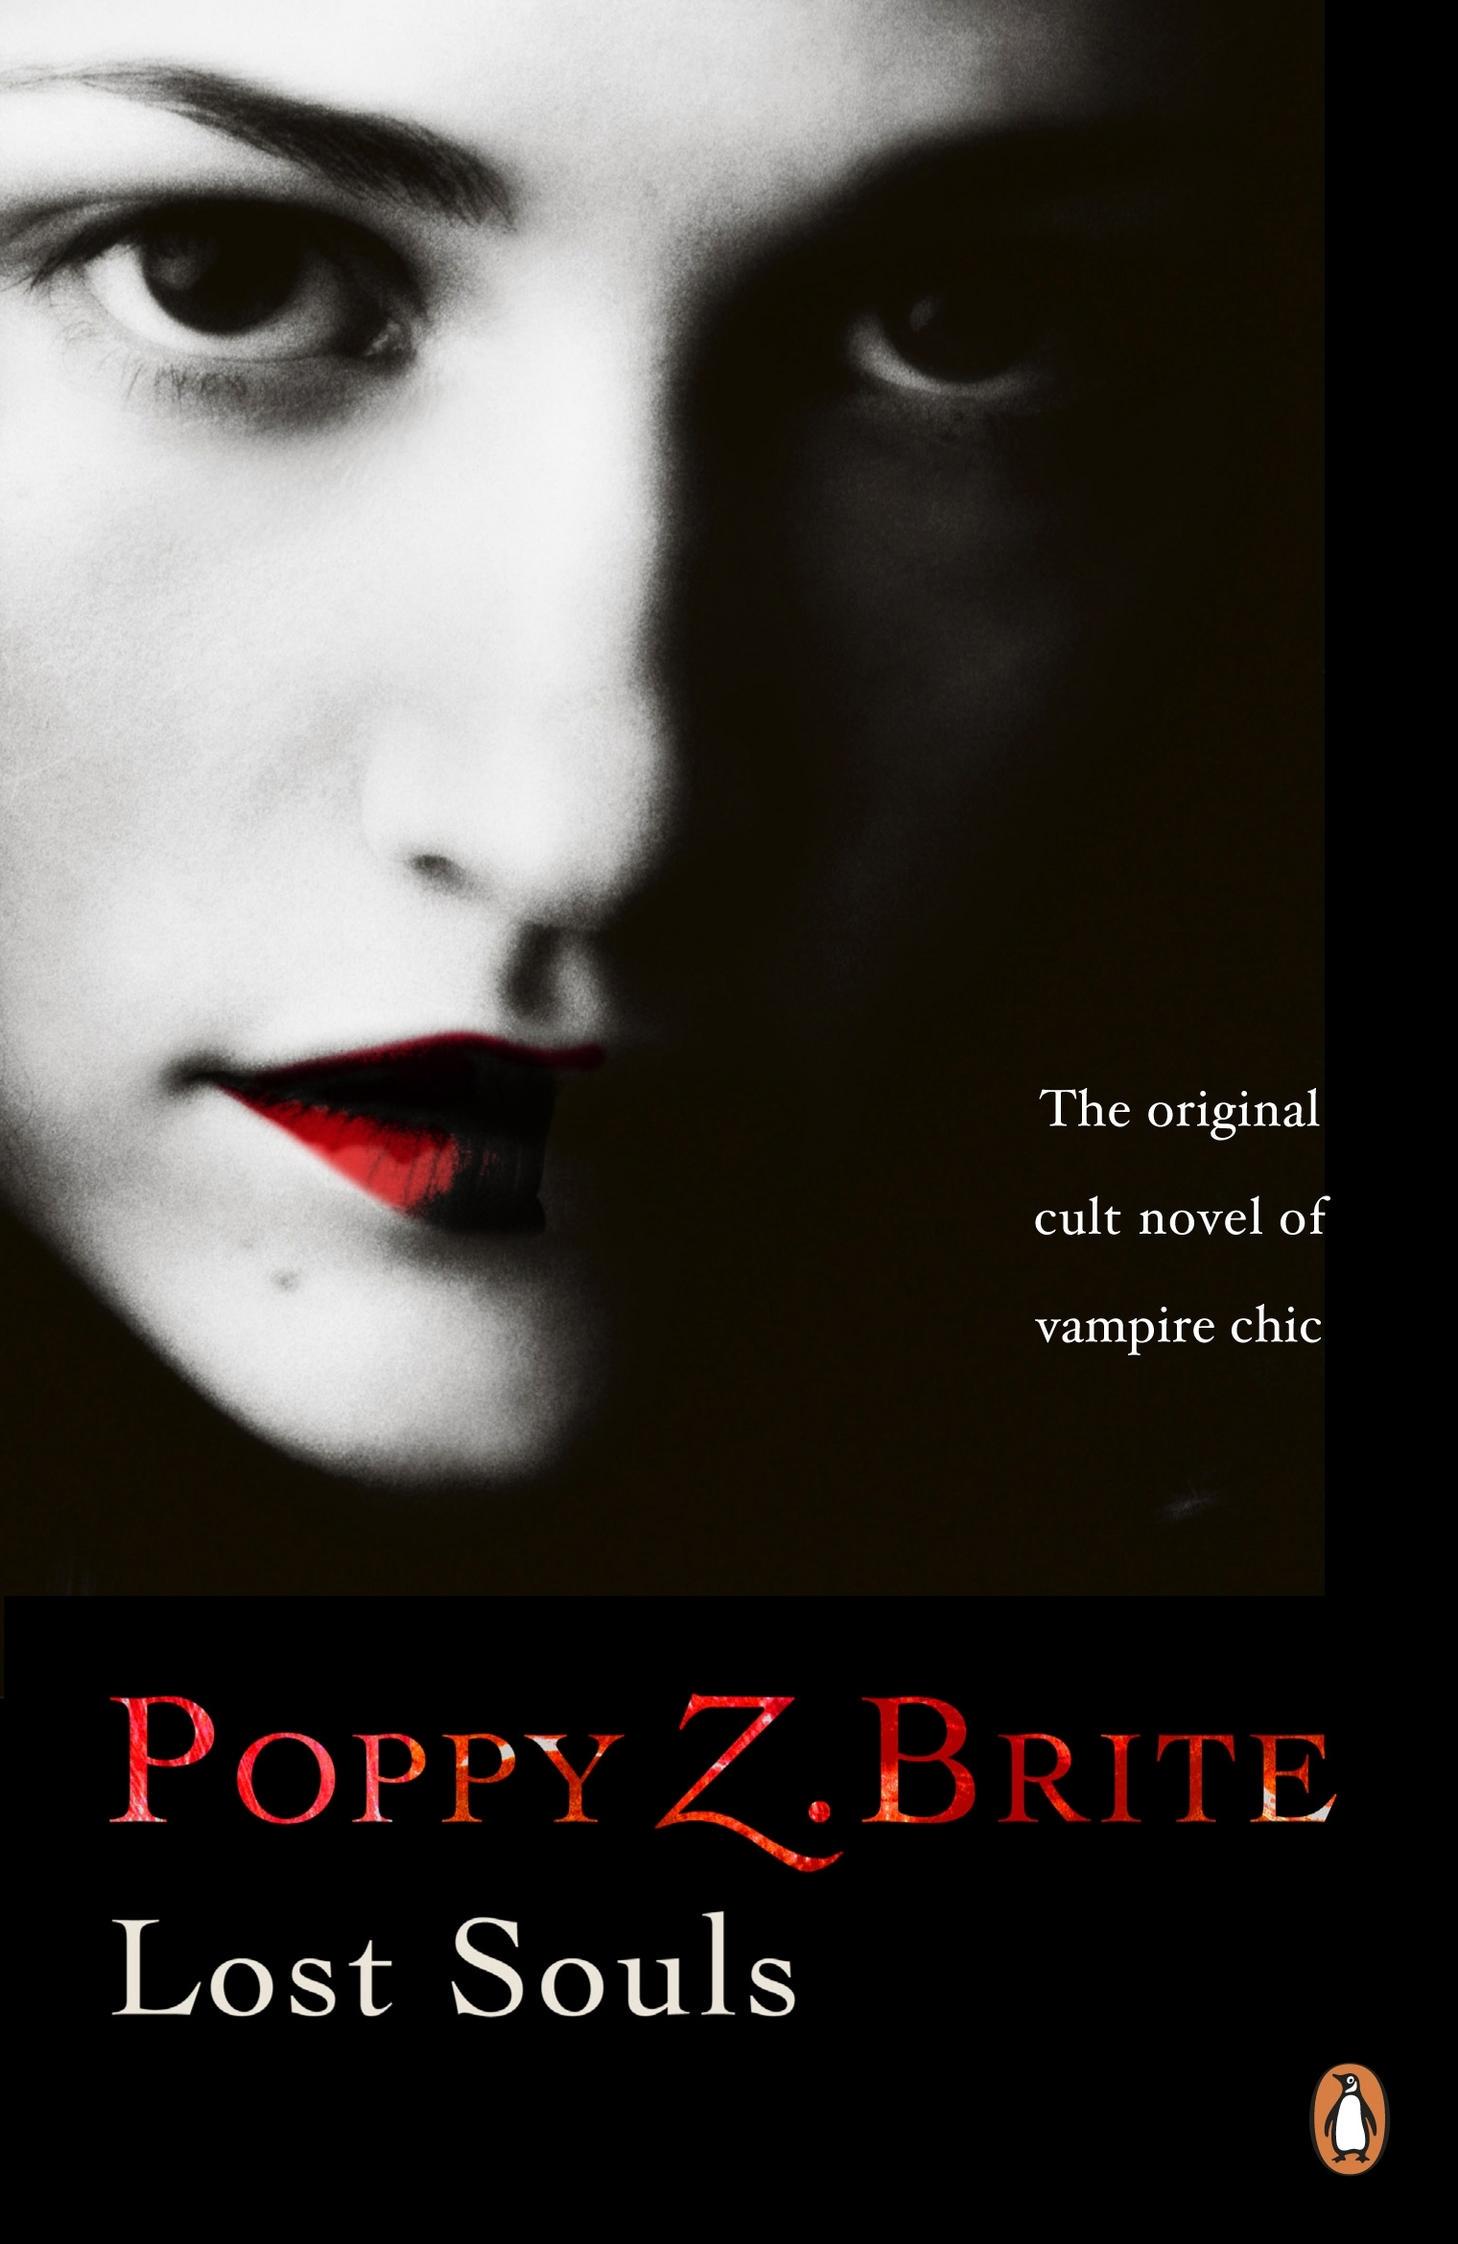 Five Vampire Novels that Don't Suck – Horror Novel Reviews